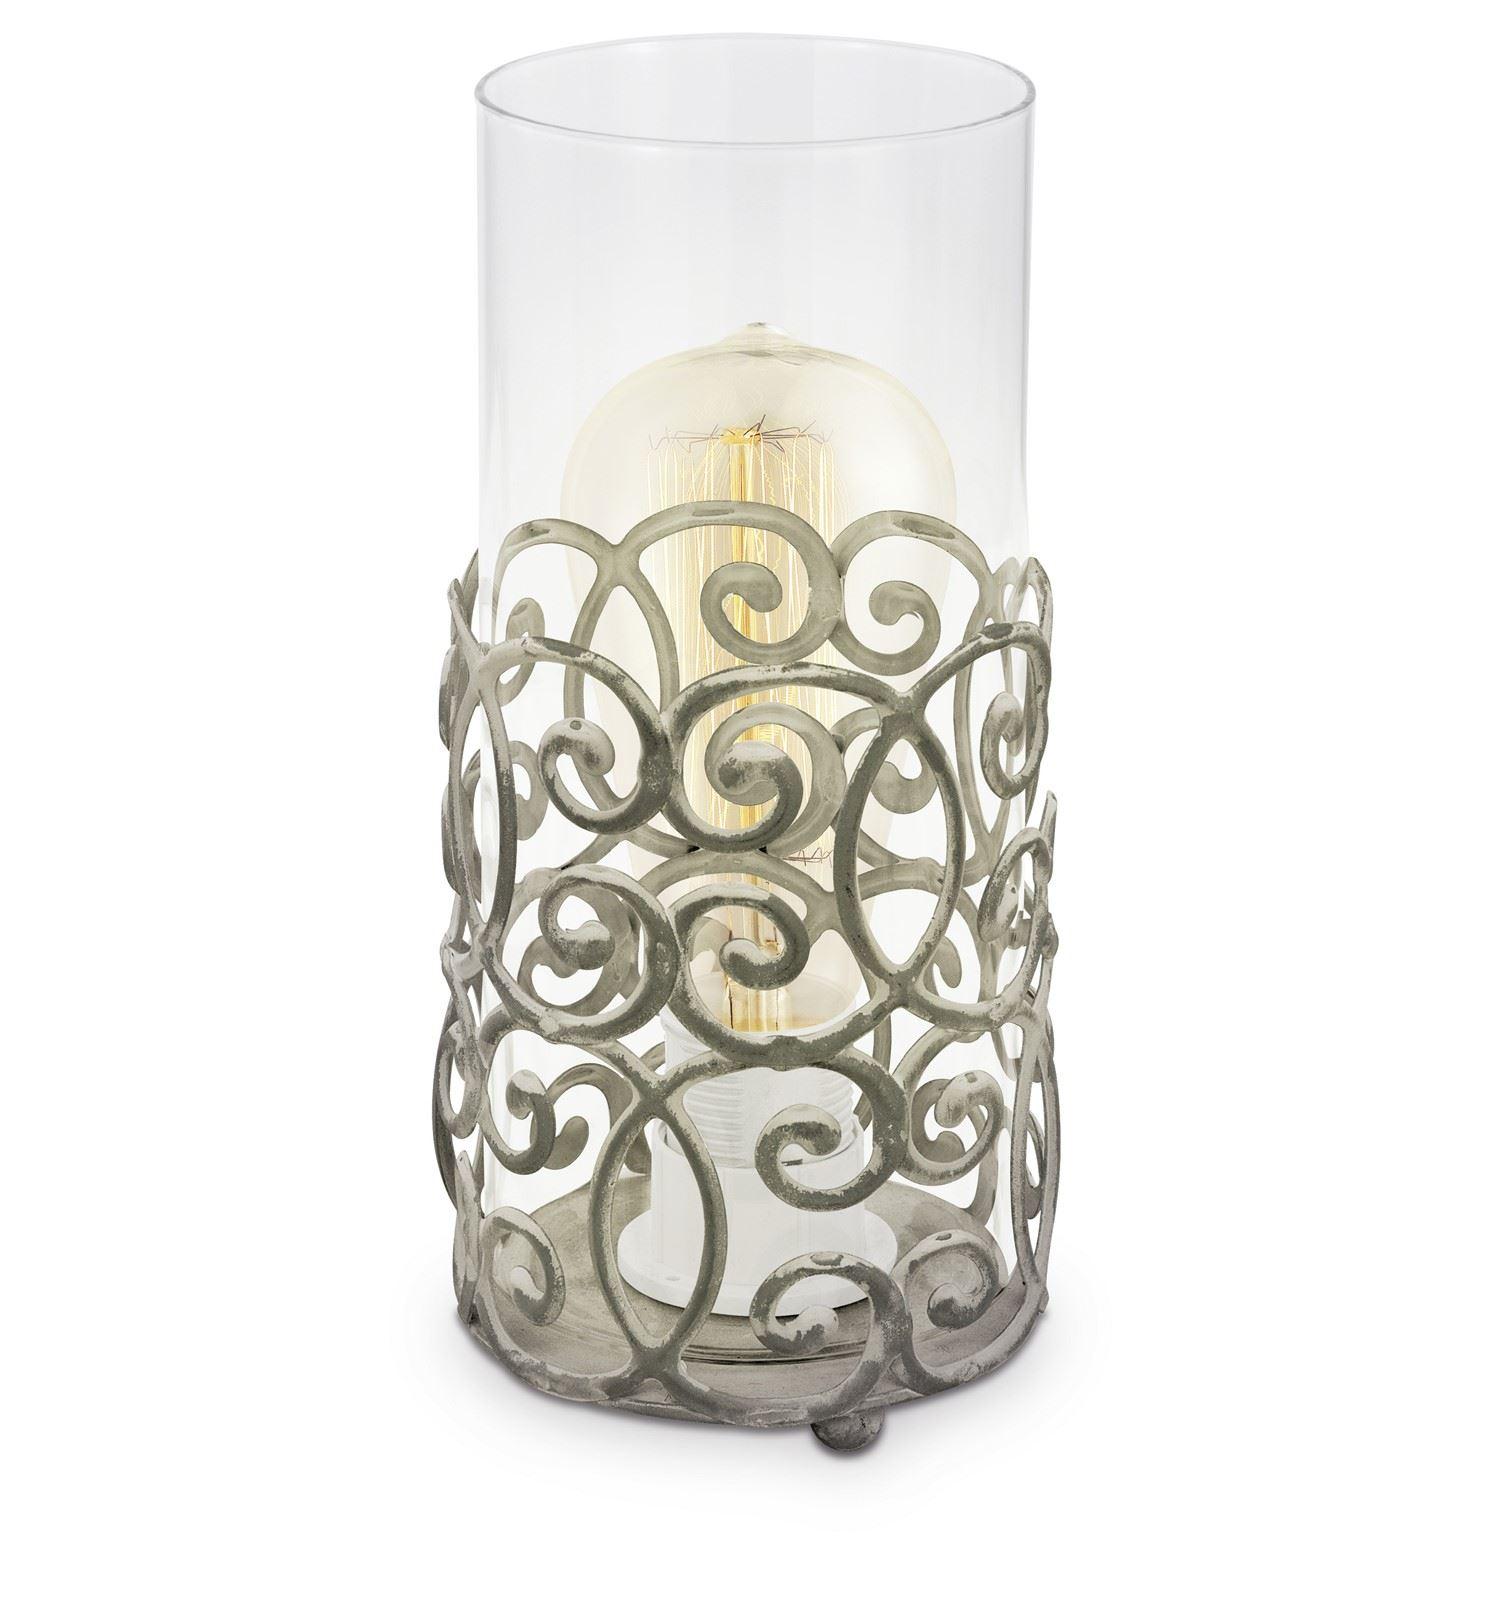 Cardigan Stunning Design Table Lamp 1 Light E27 Brown Patina Finish